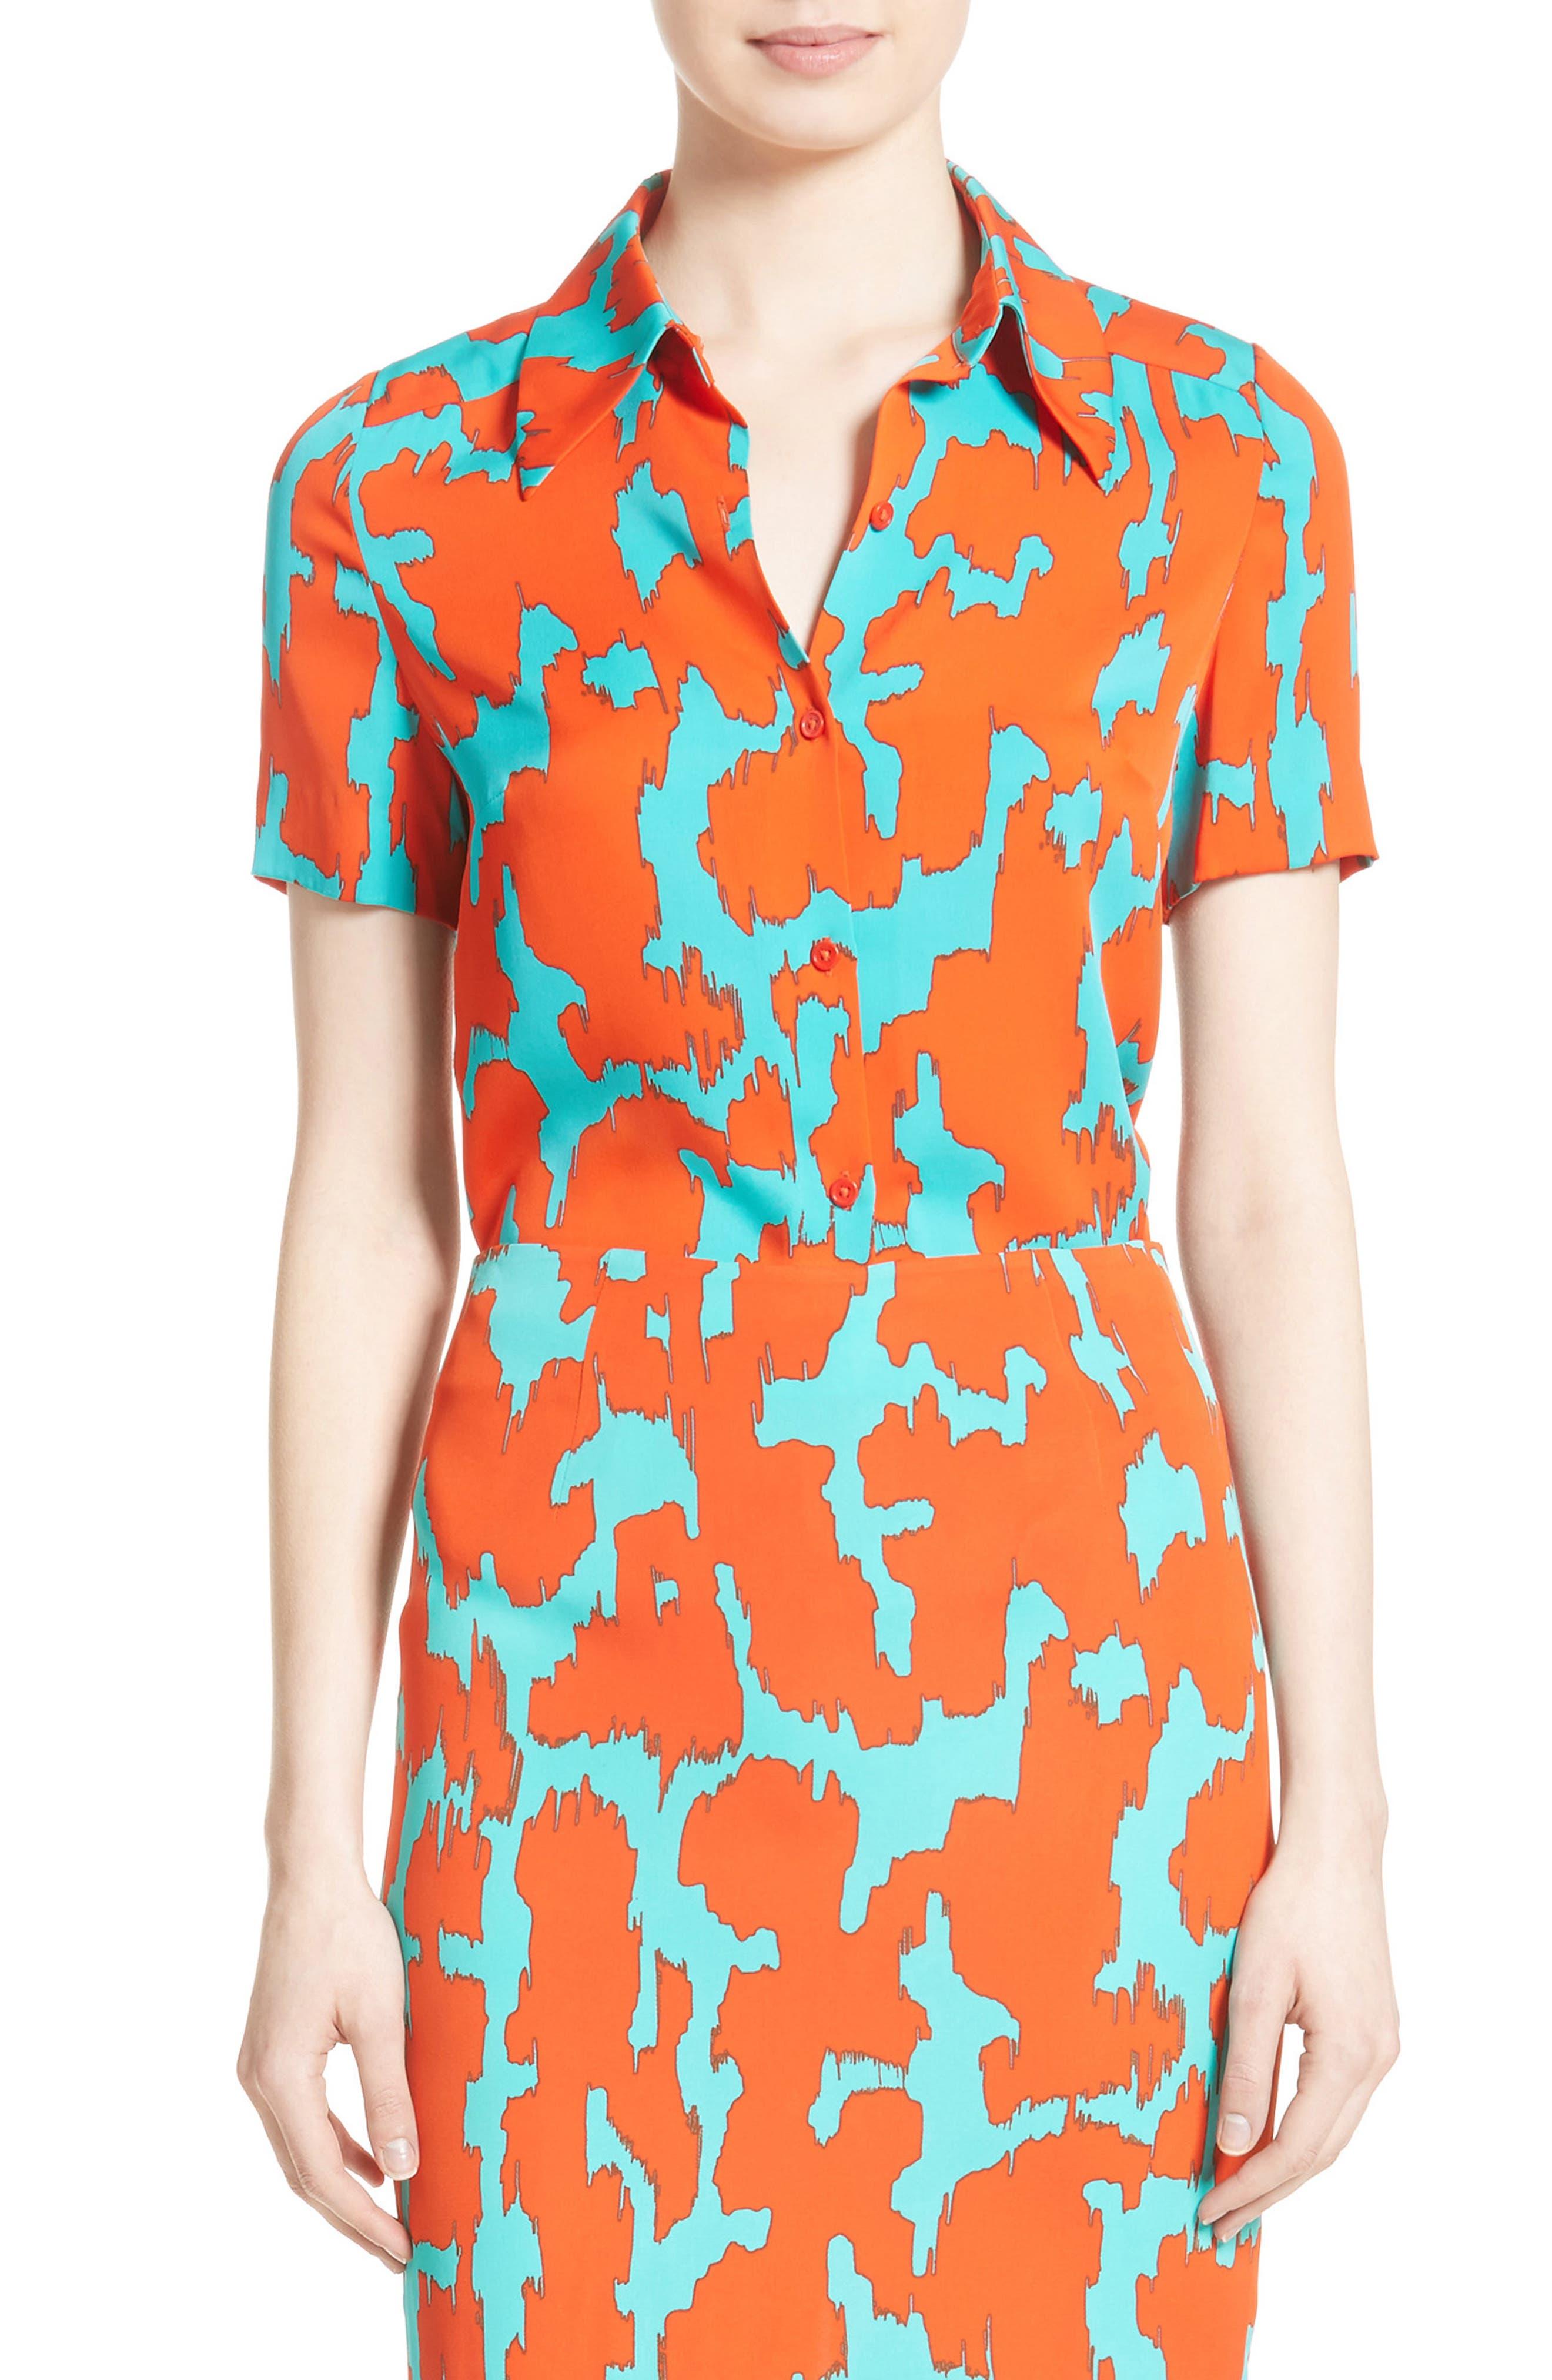 Diane von Furstenburg Print Stretch Silk Shirt,                             Main thumbnail 1, color,                             845